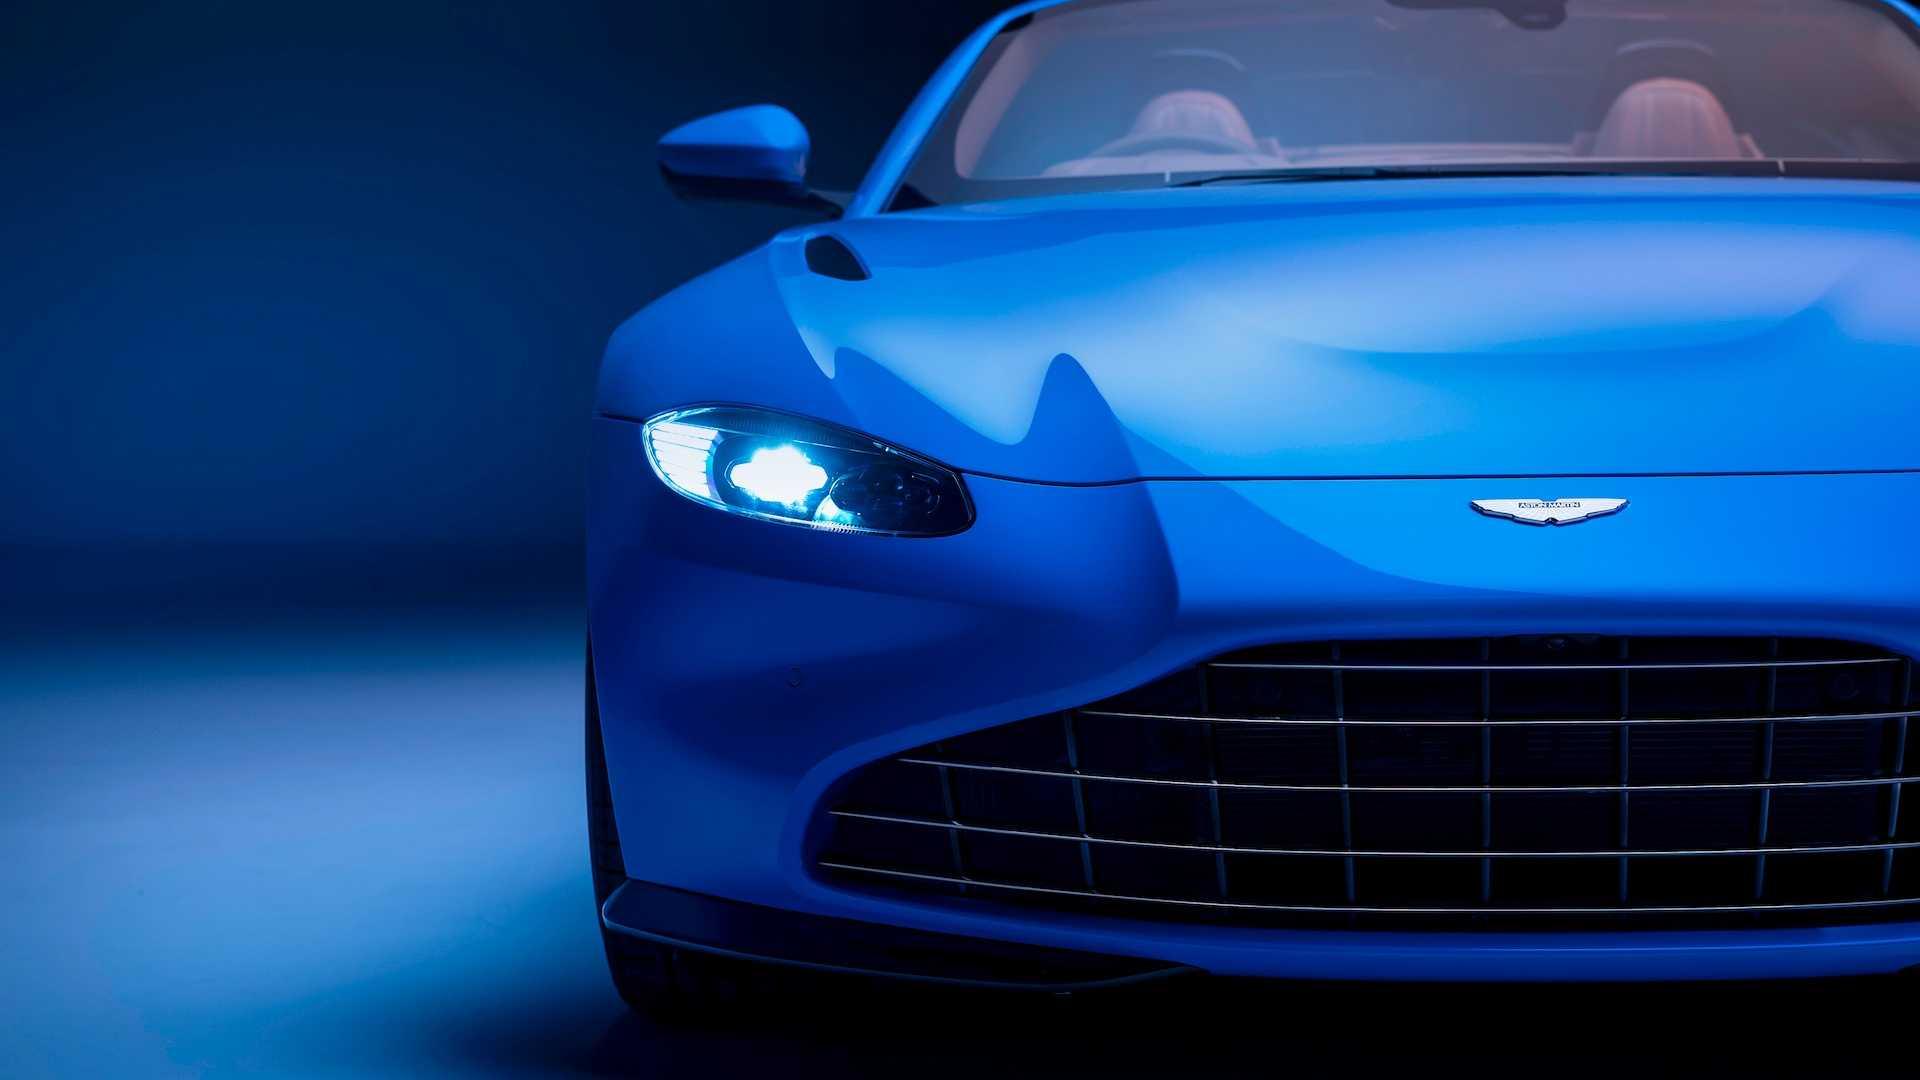 2021-aston-martin-vantage-roadster-9